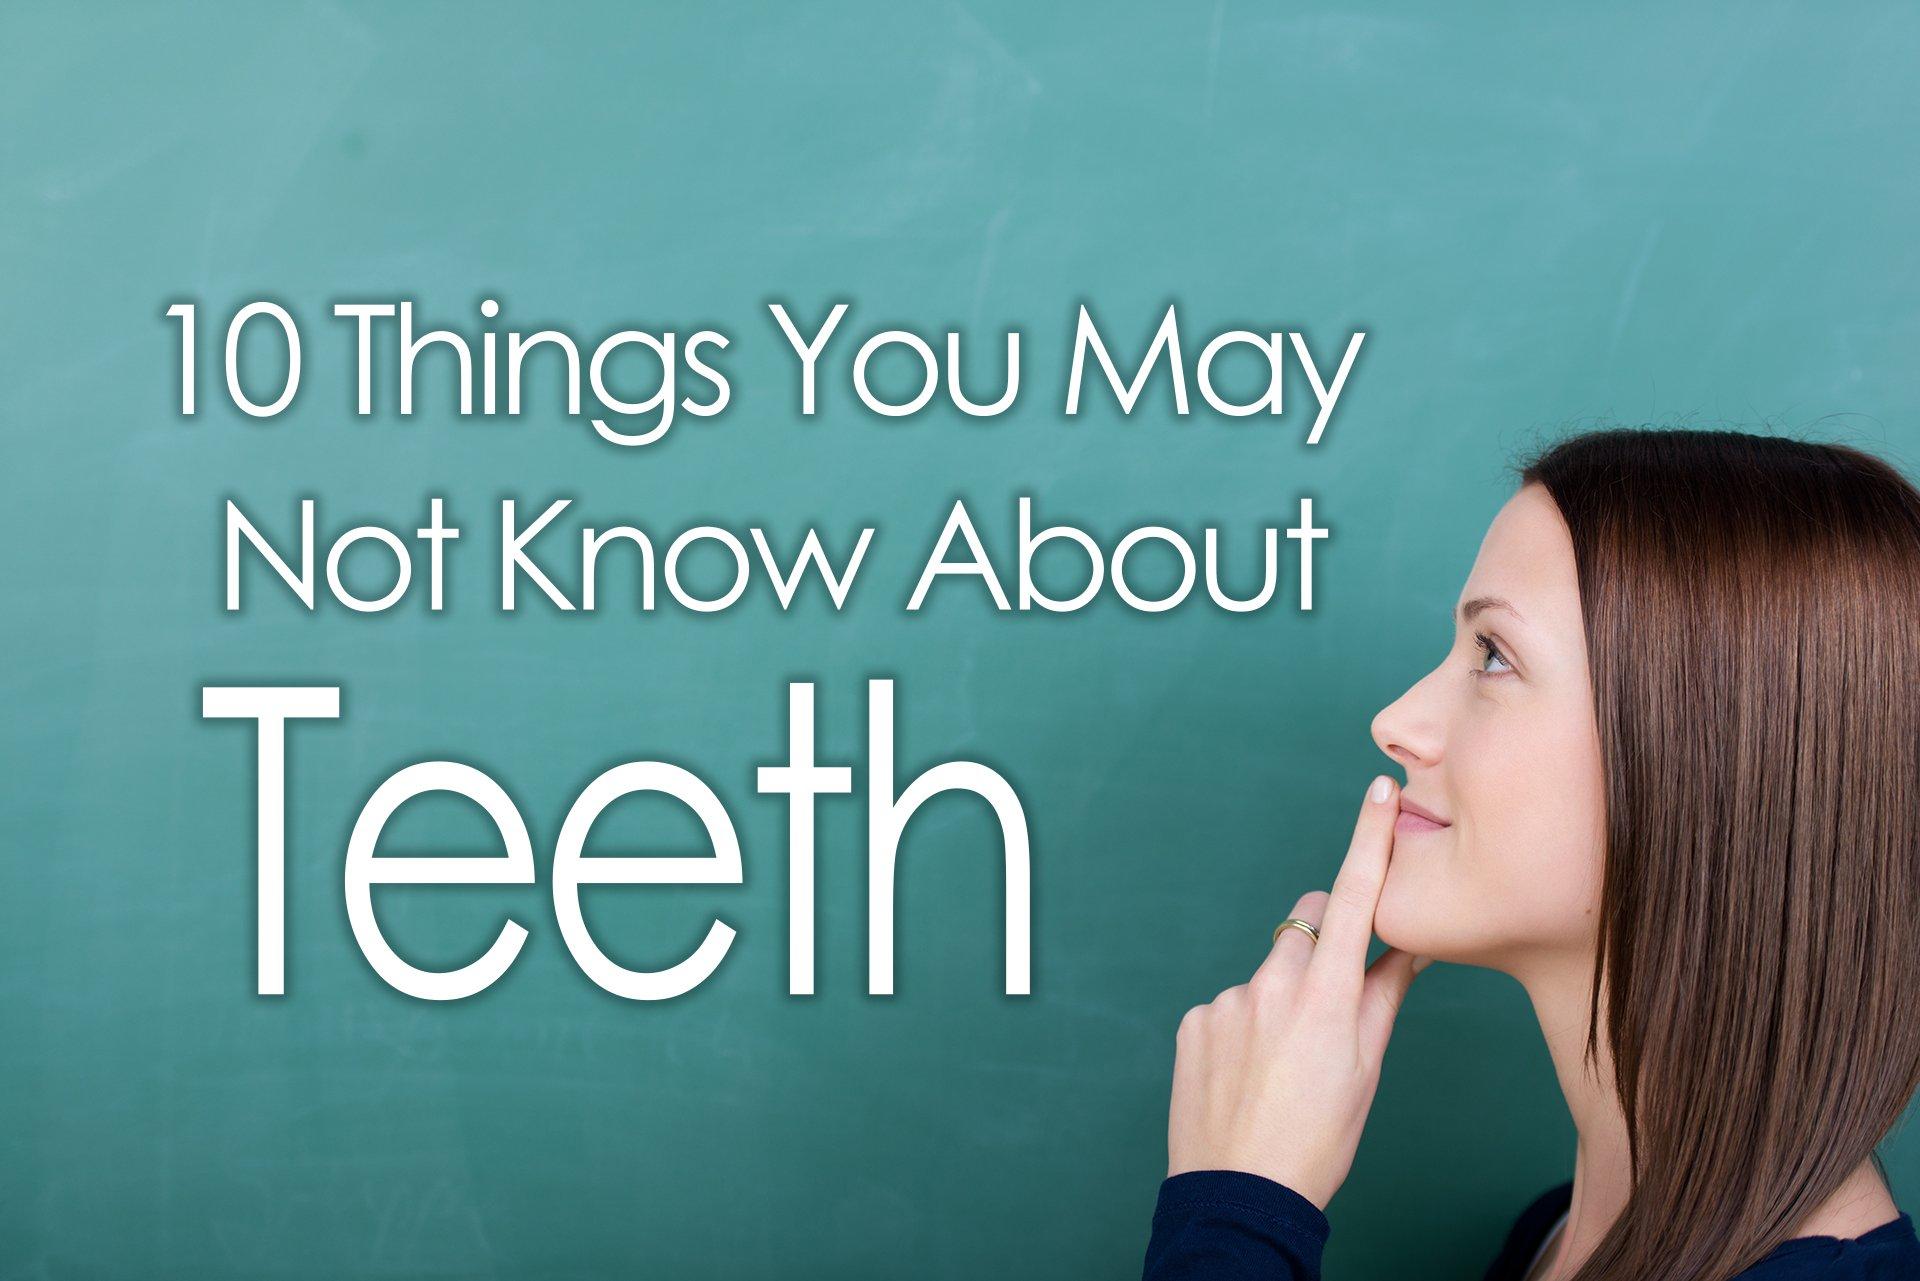 10 dental facts